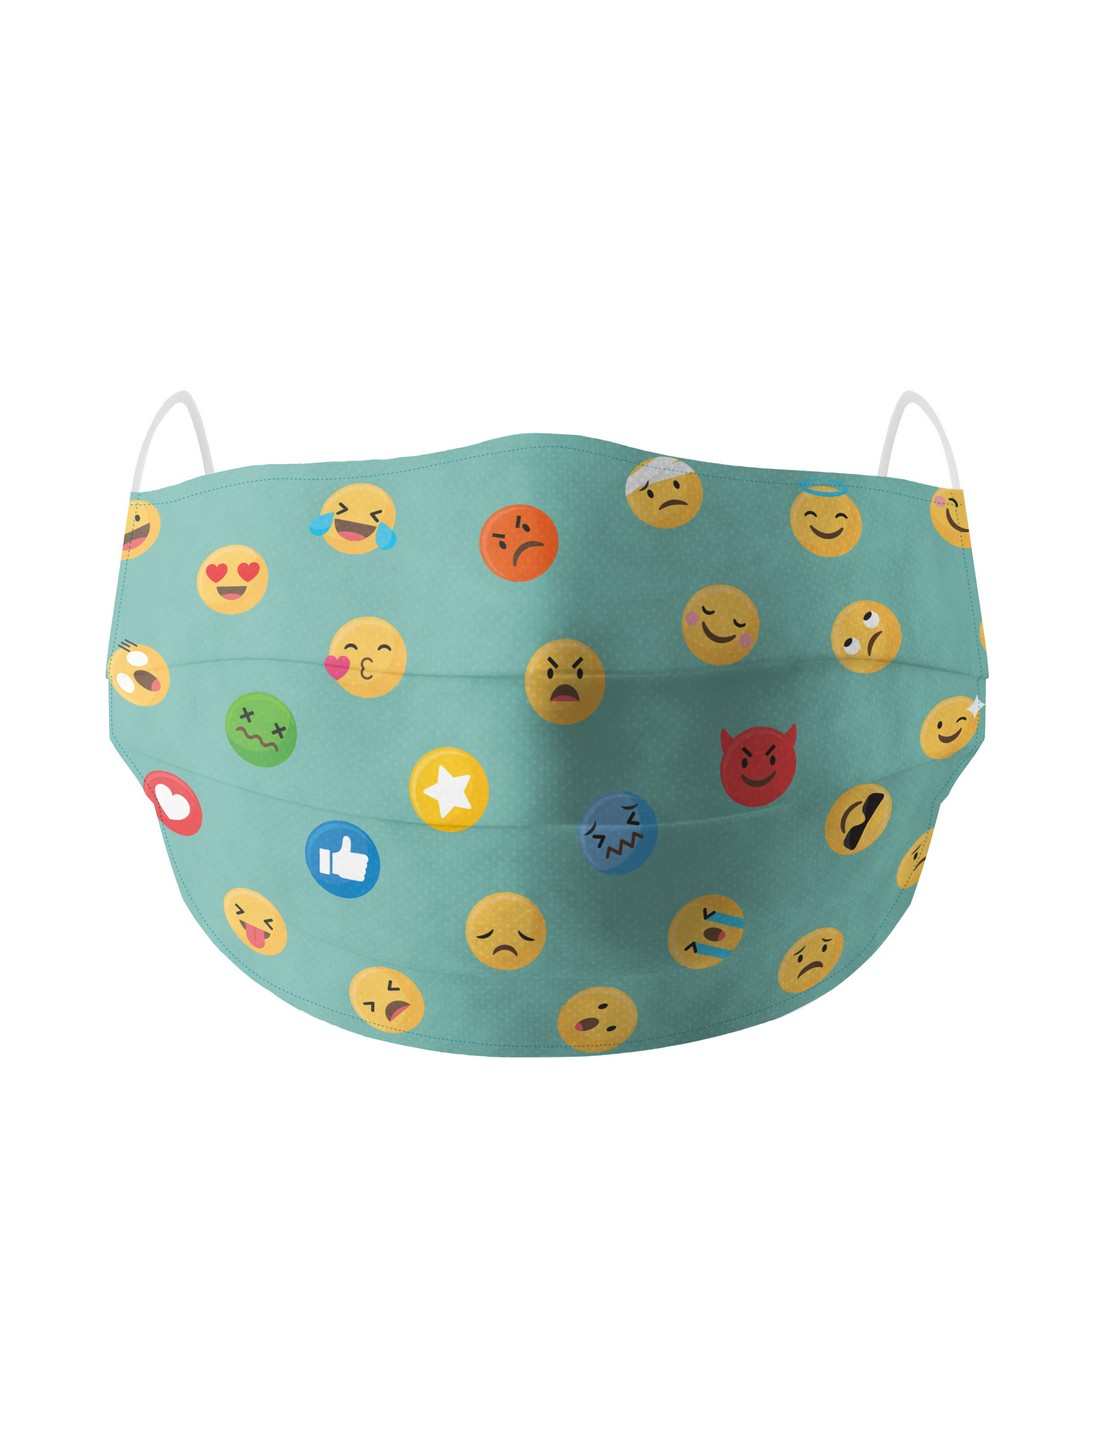 Soxytoes | Soxytoes Blue Stylish Protective Washable Mouth Cover Face Mask